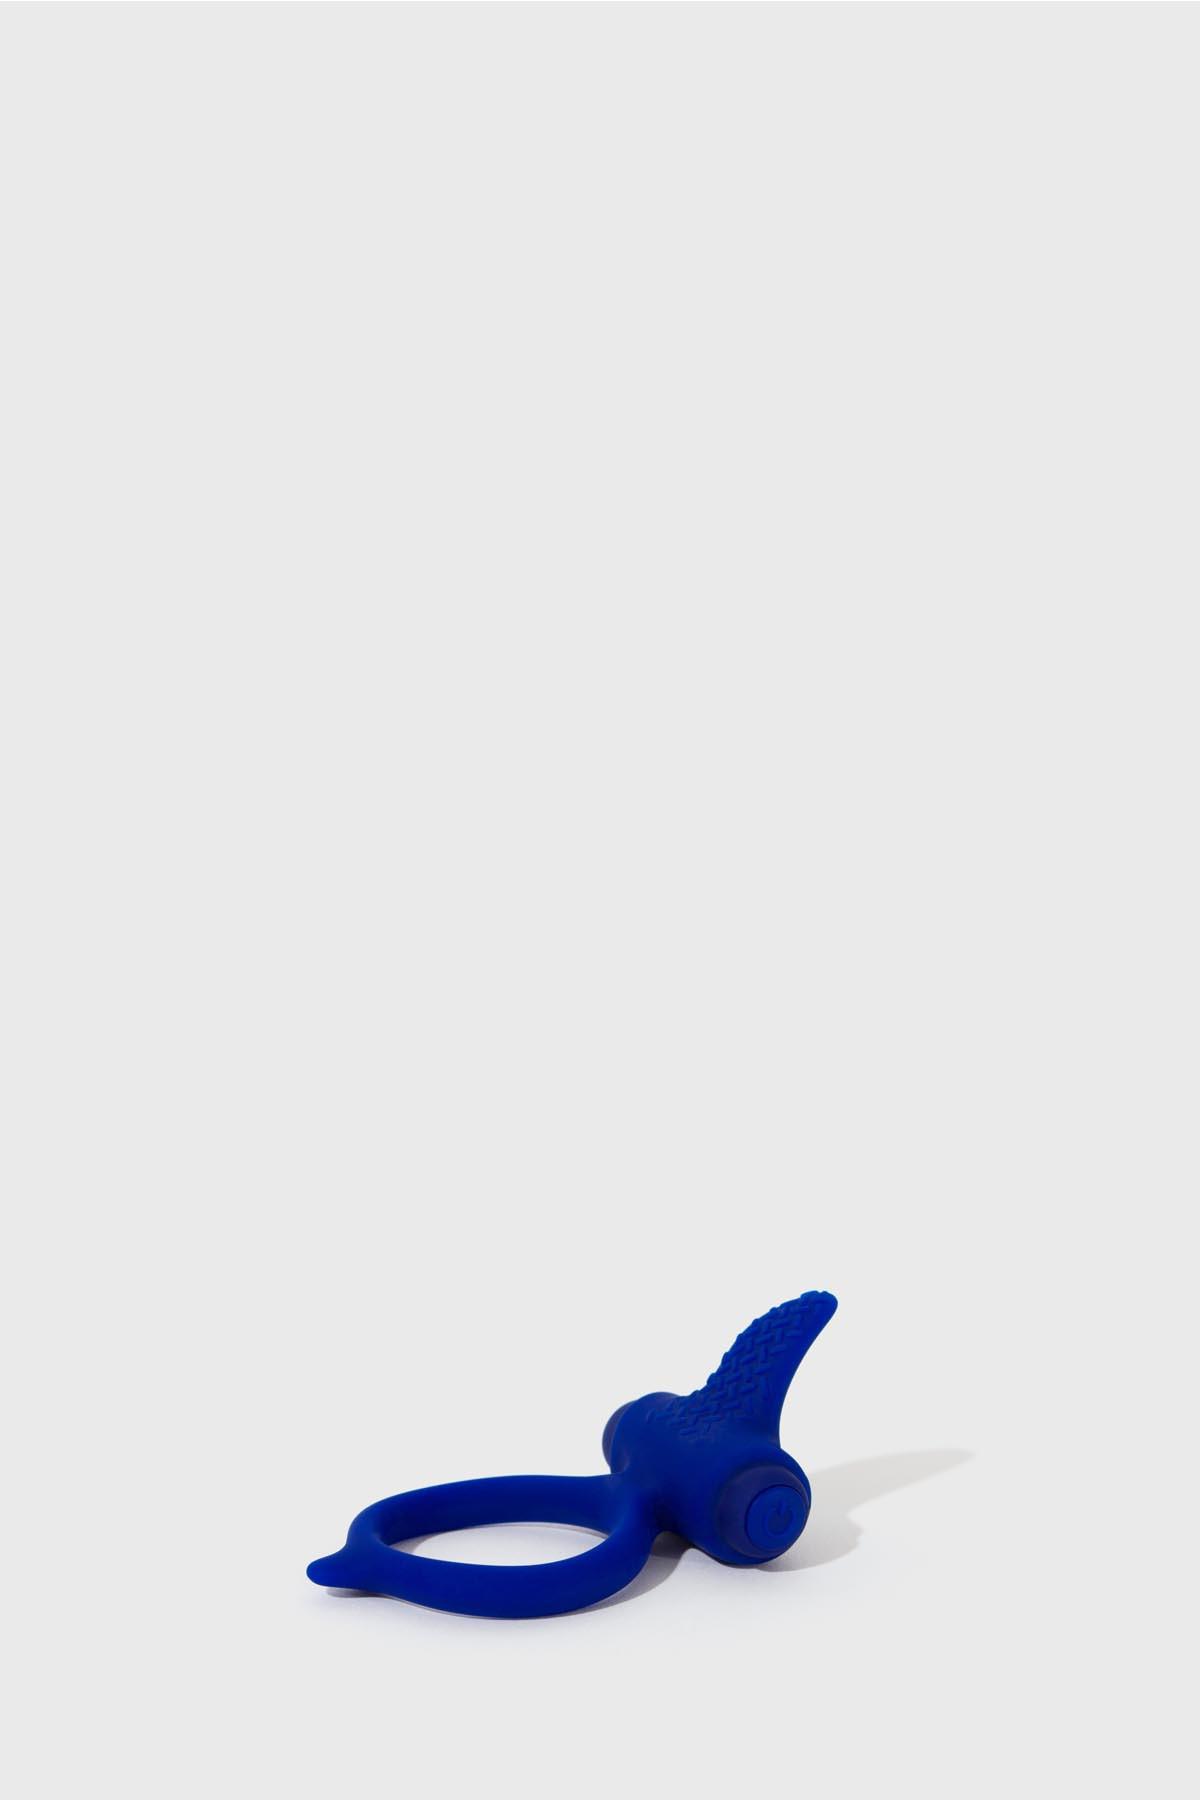 BCHARMED BASICS REFLEX BLUE